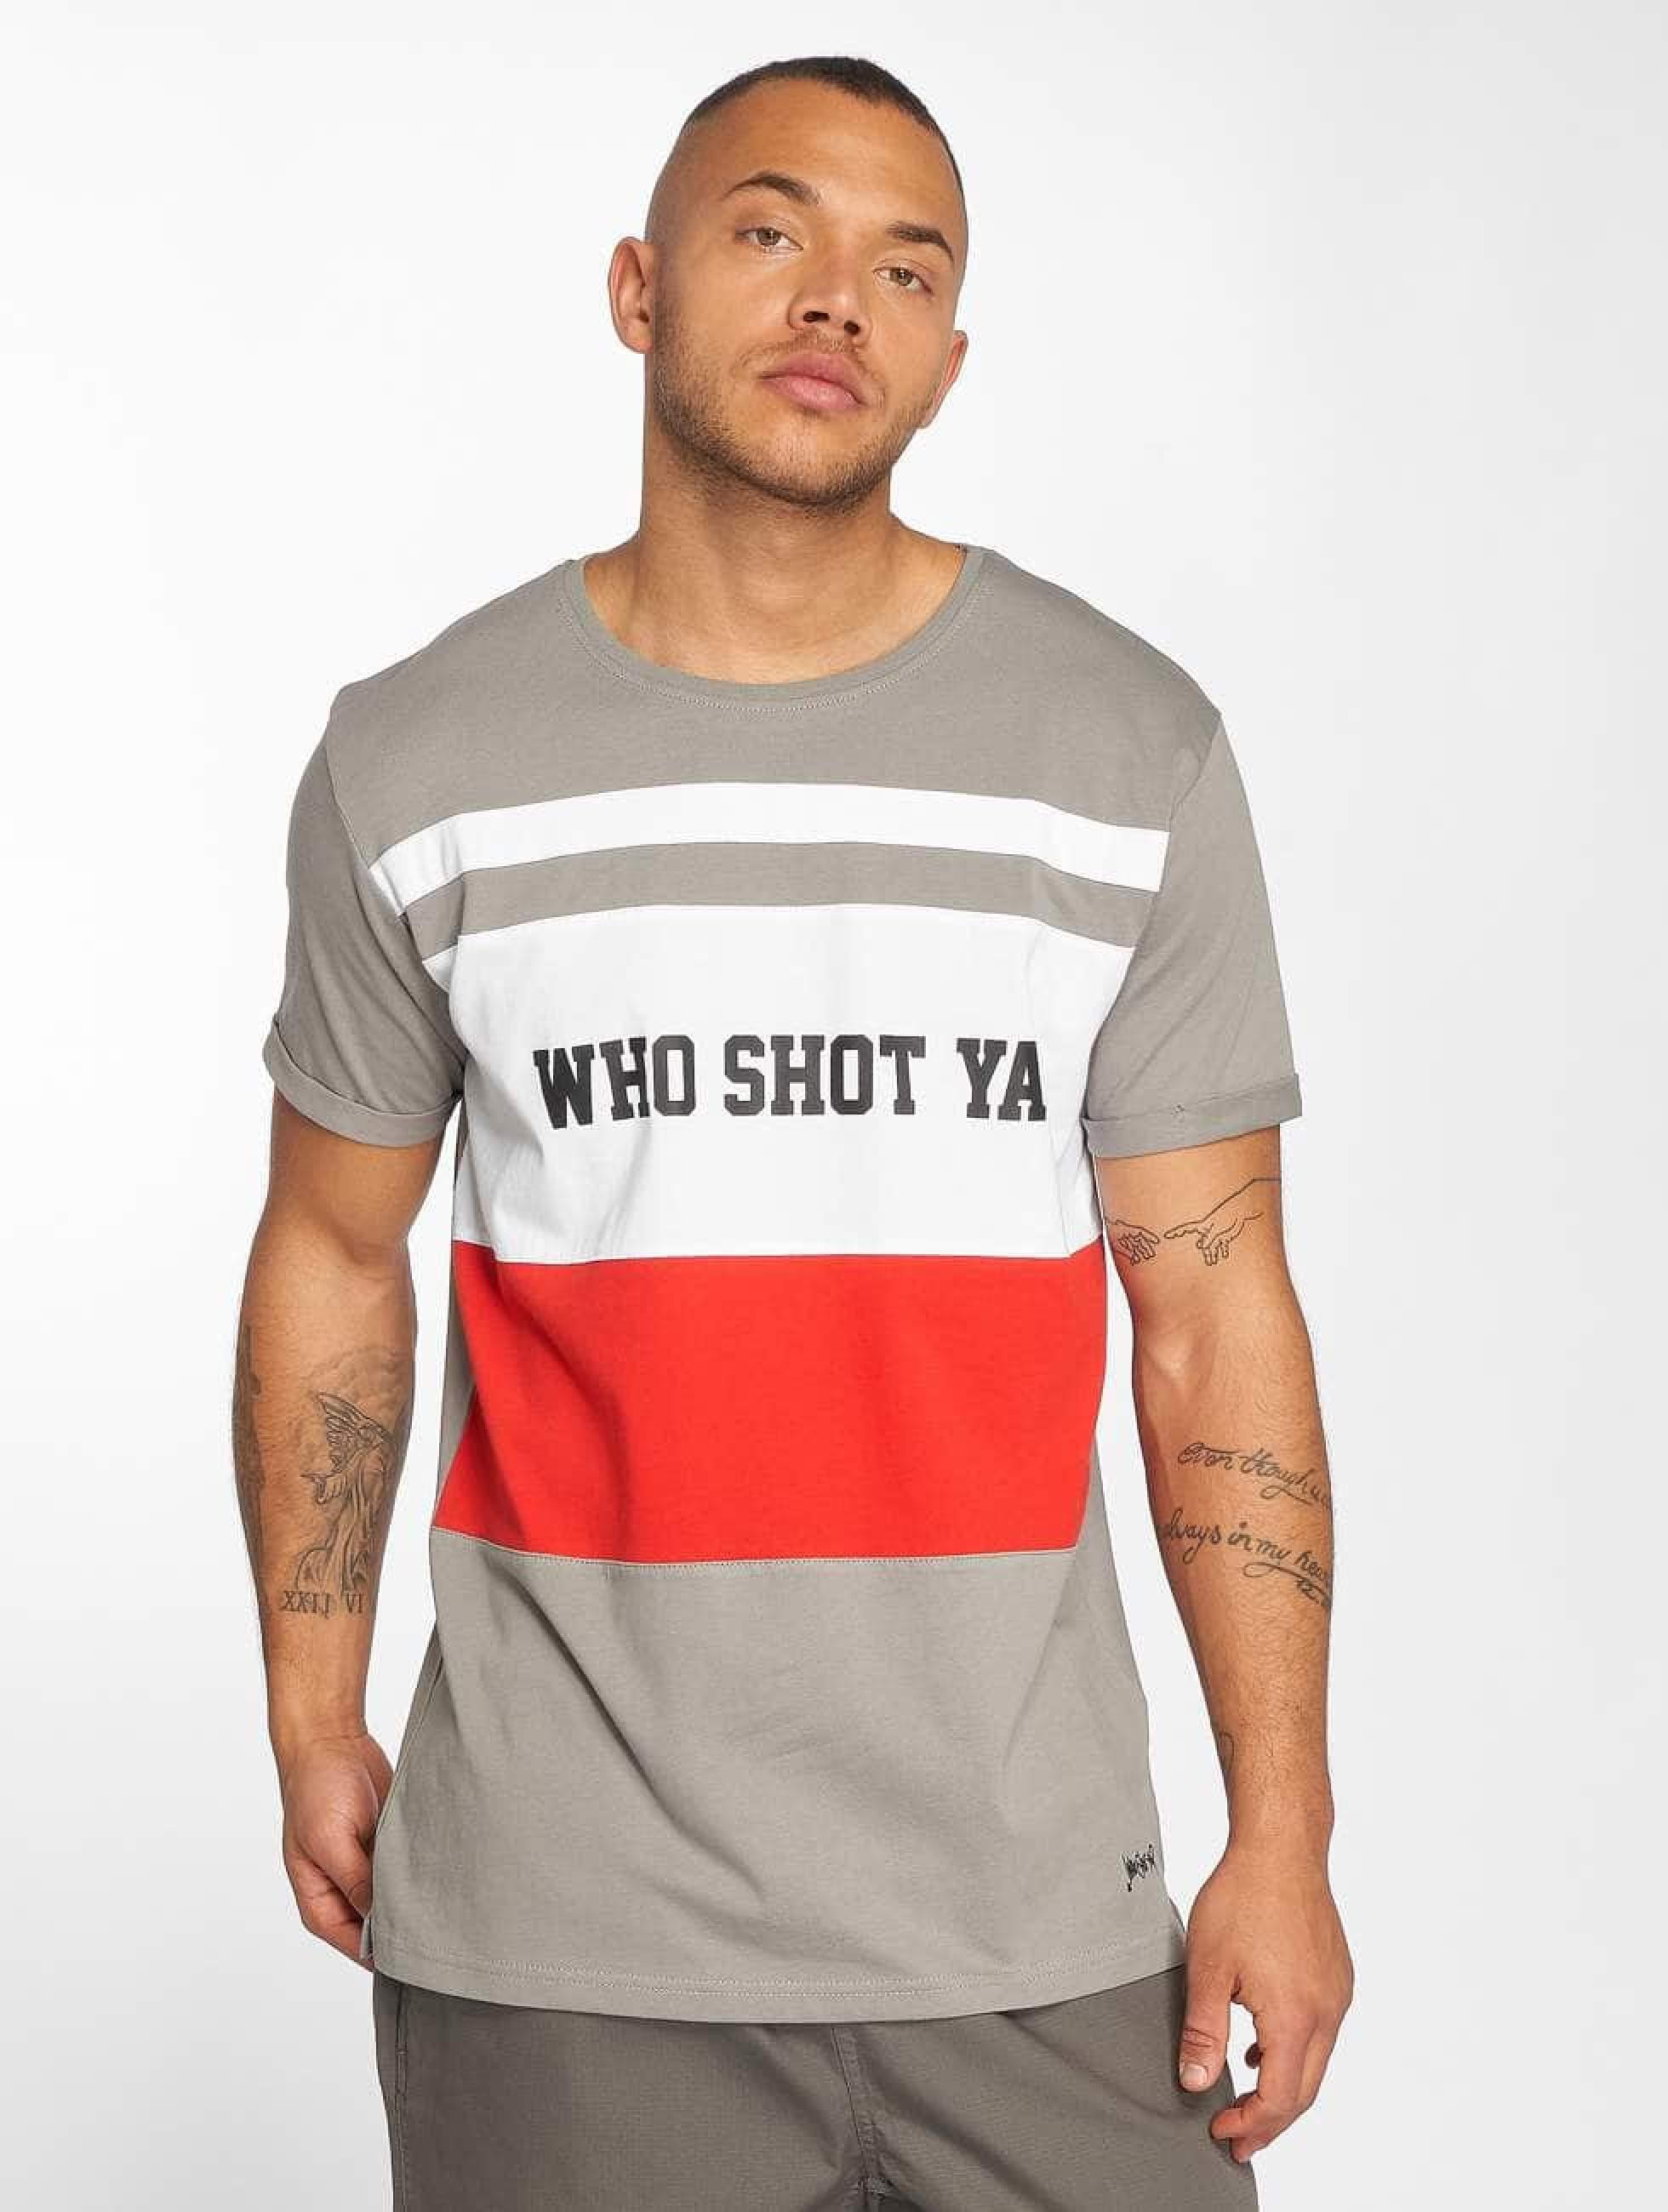 Who Shot Ya? / T-Shirt PortMorris in grey XL